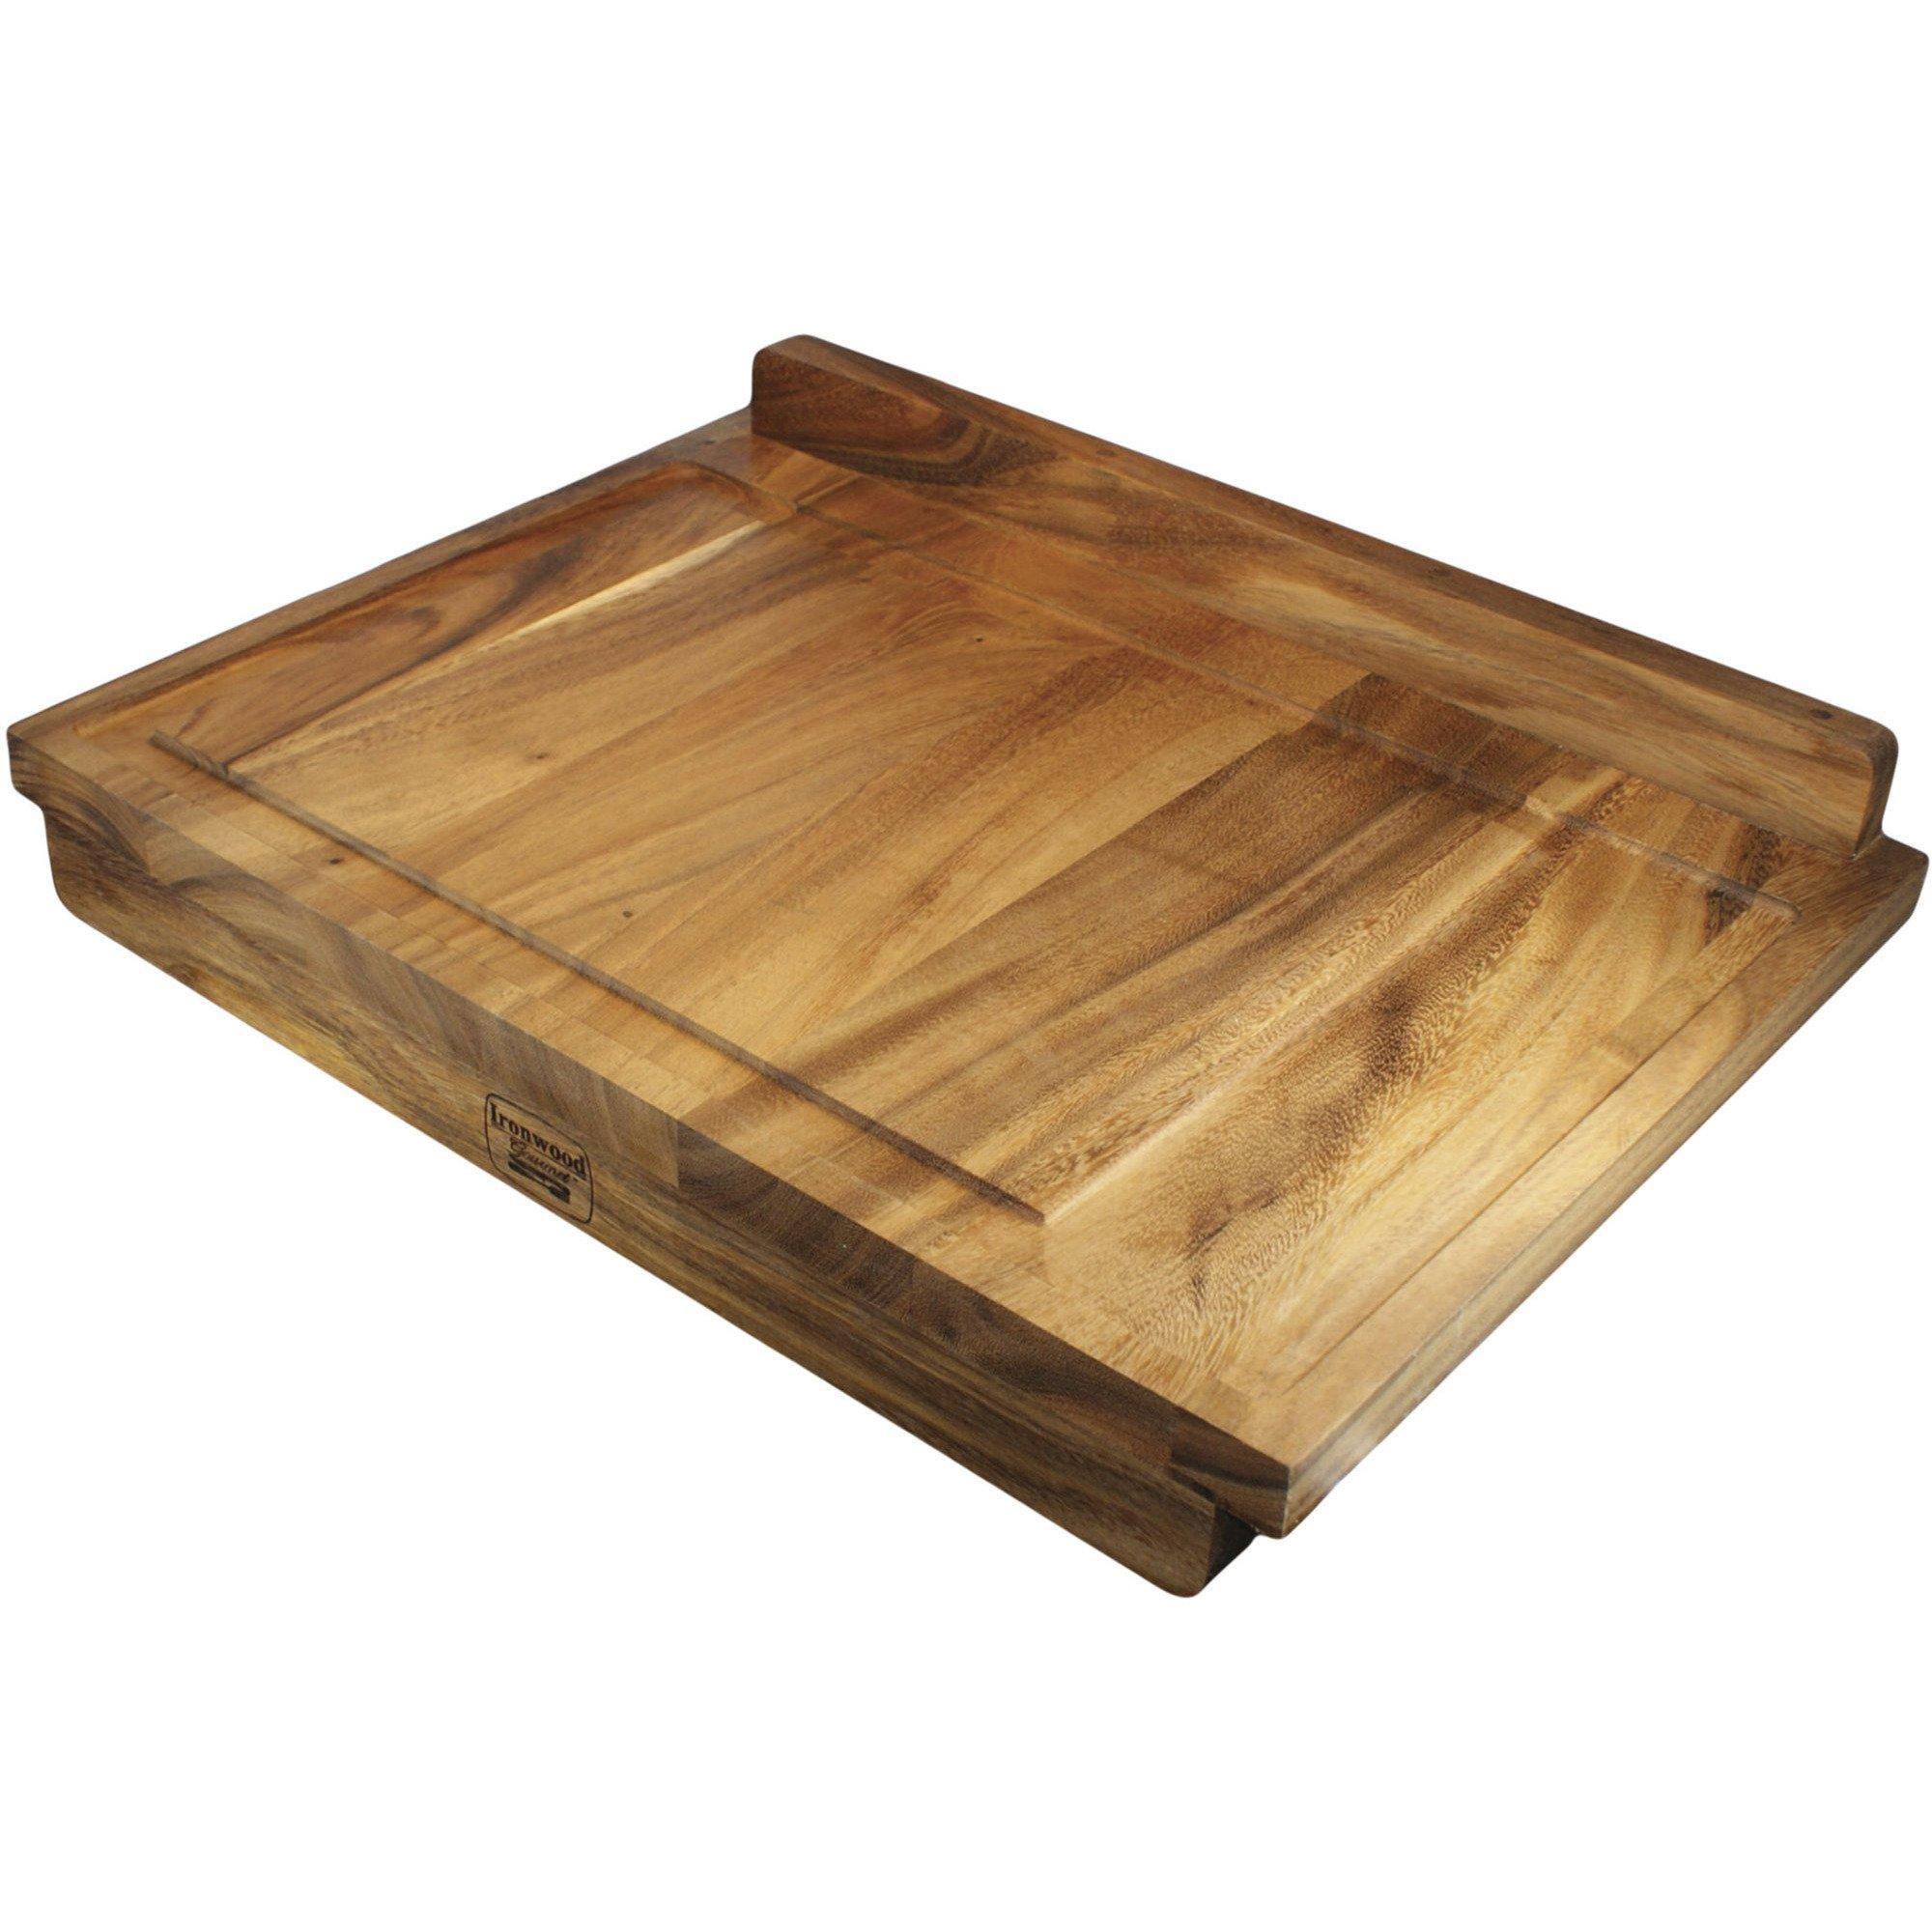 Ironwood Gourmet Bakbord- och Skärbräda 603 x 436 x 32 cm